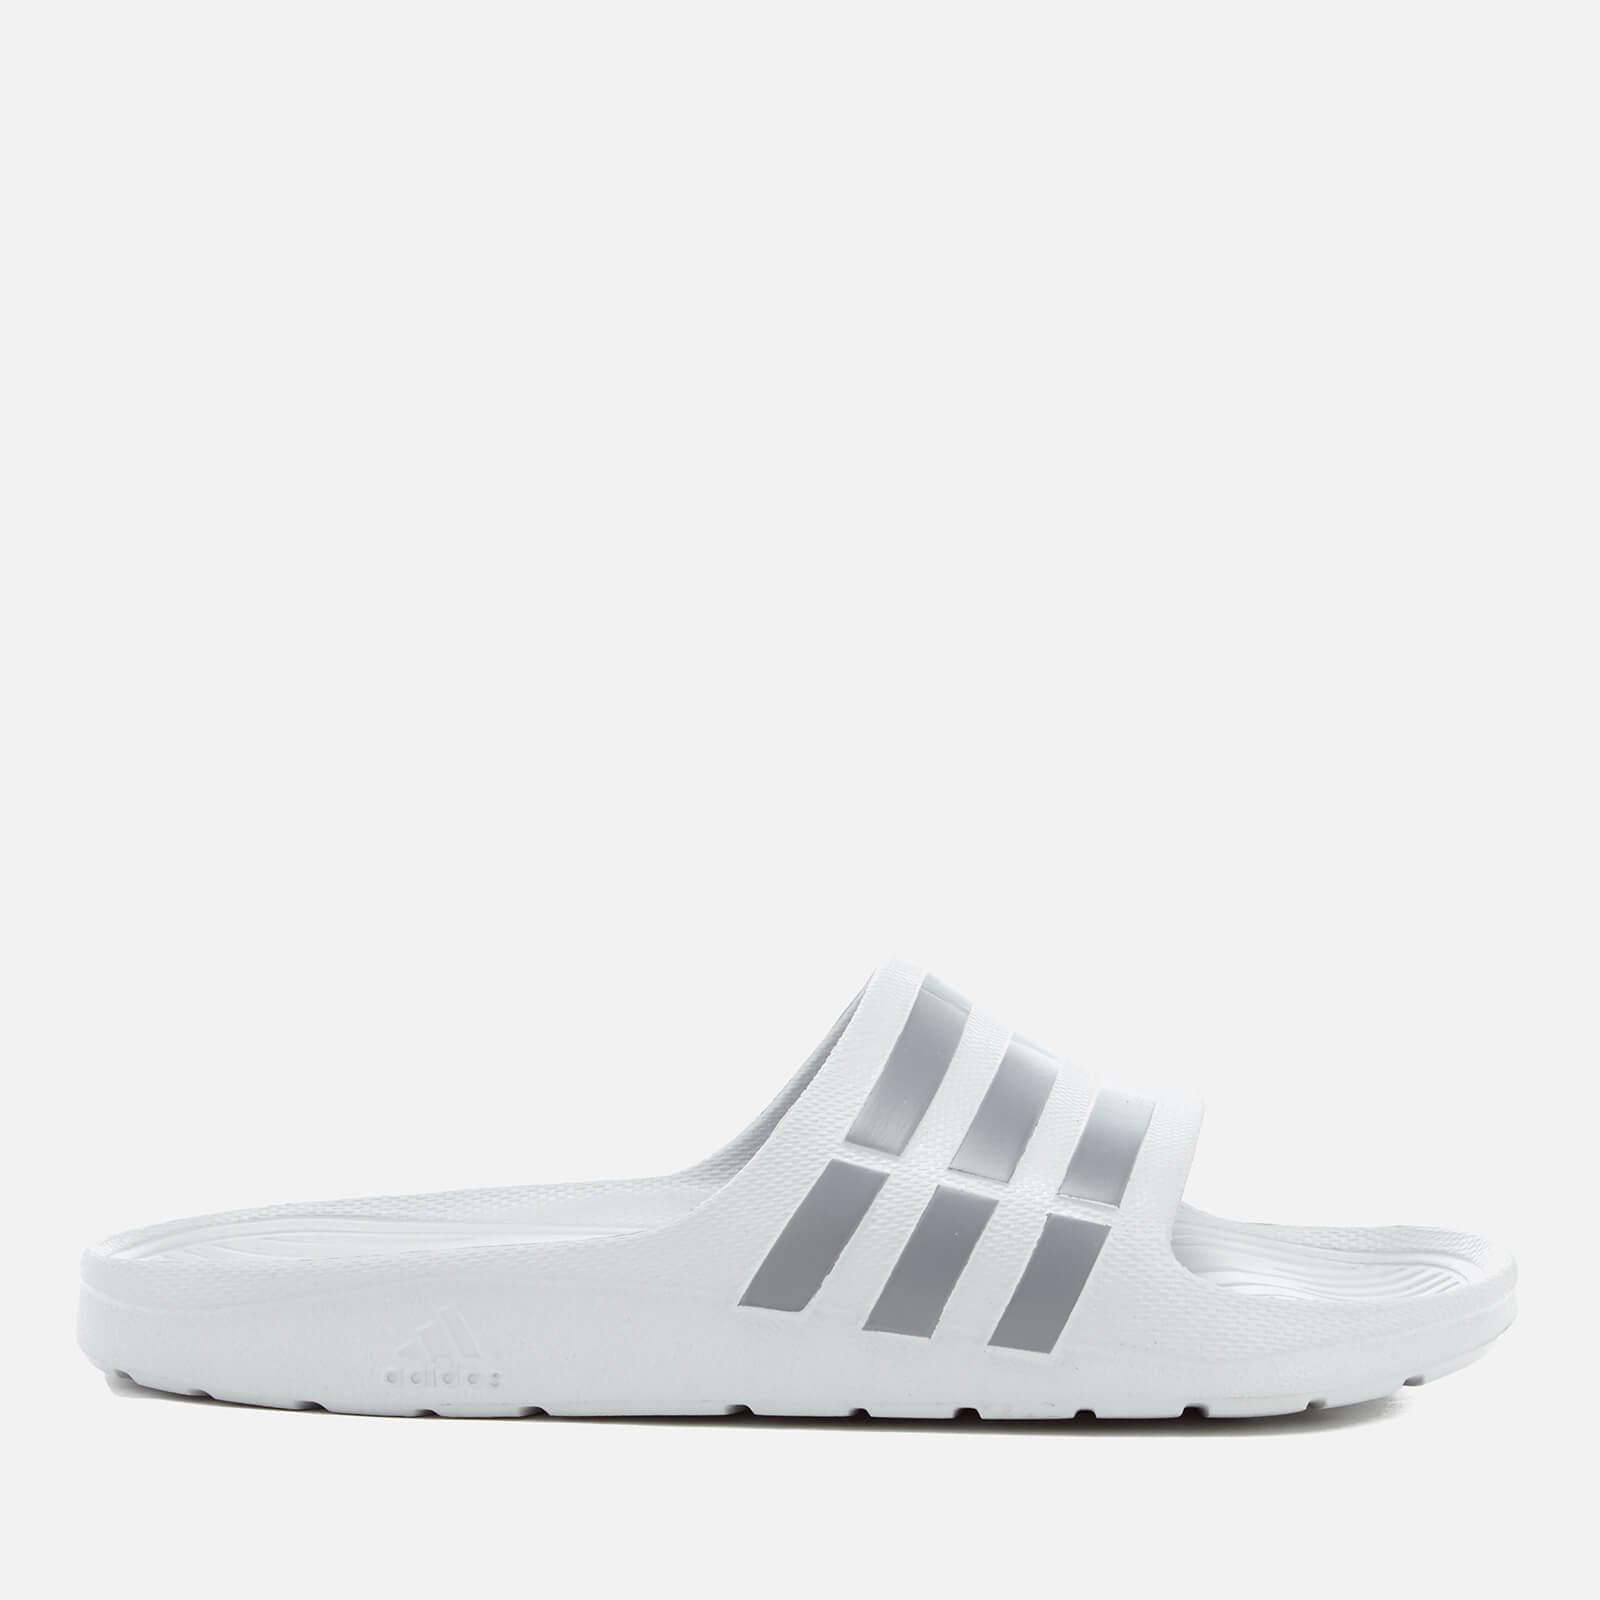 28fba1f8da83 adidas Men s Duramo Slide Sandals - Clear Onix Sports   Leisure ...